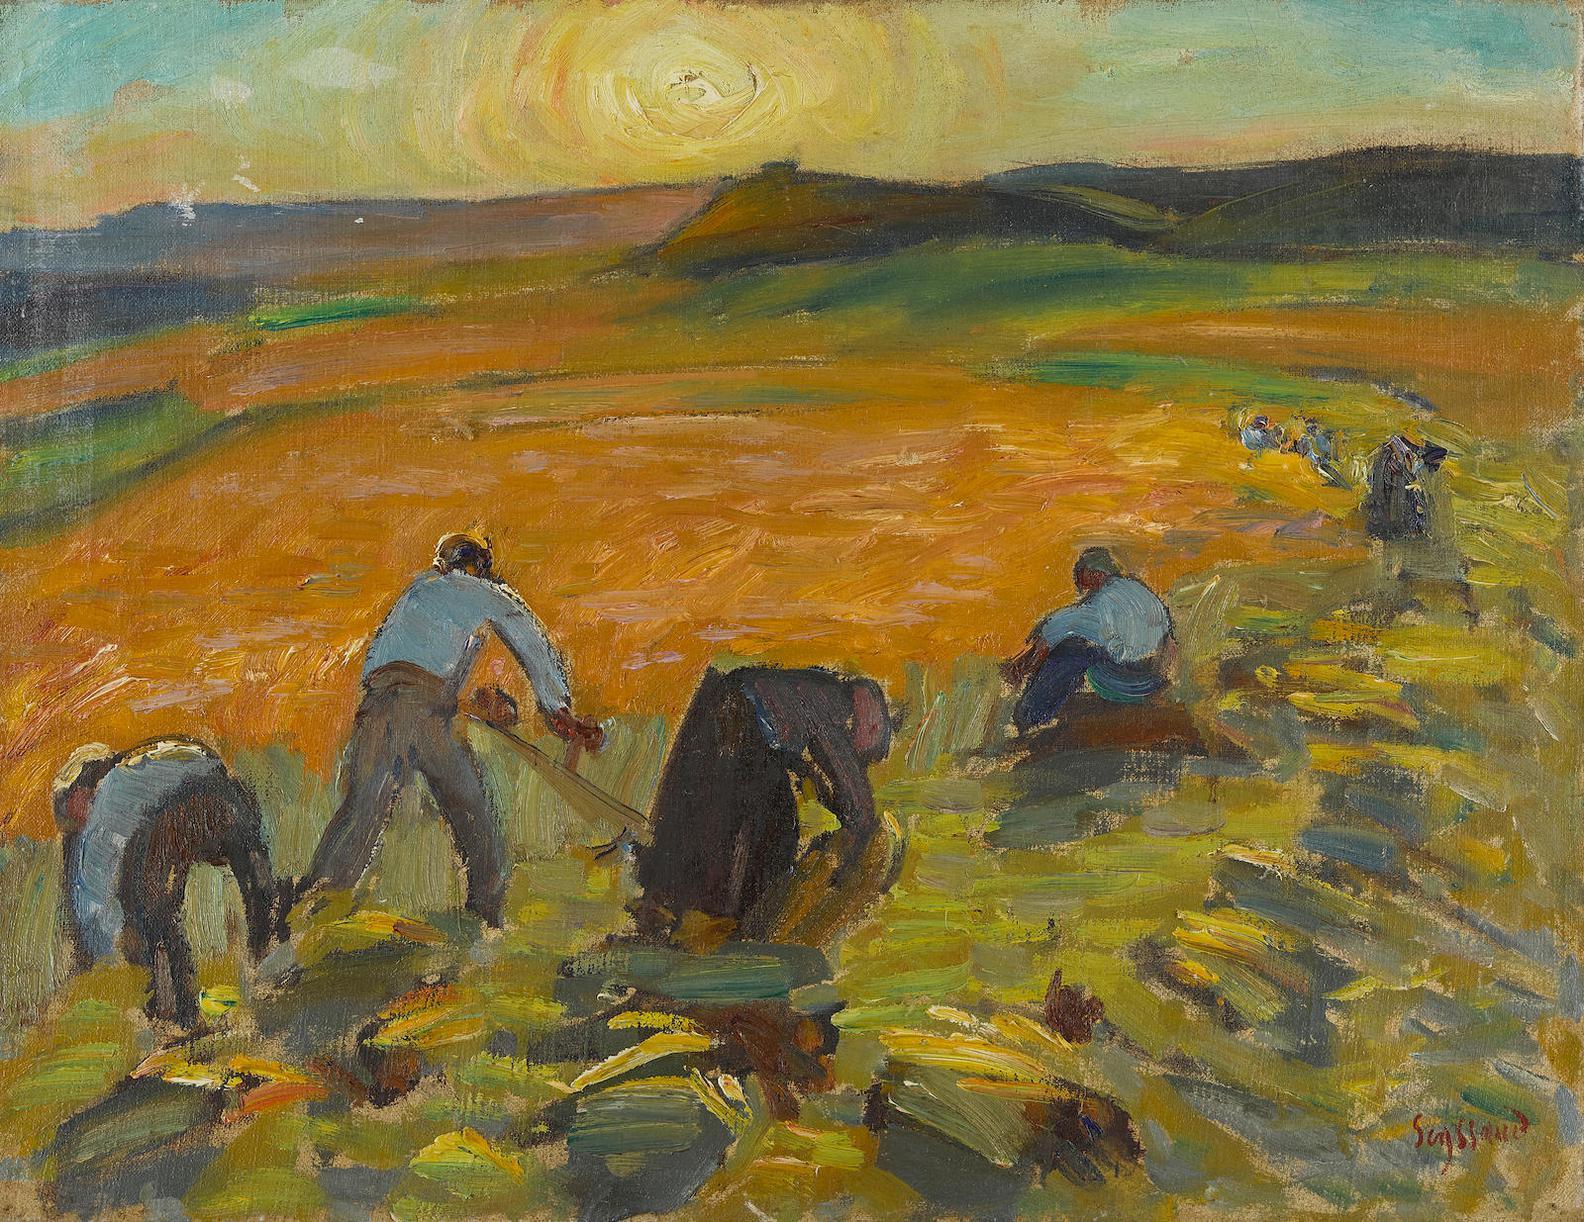 Rene Auguste Seyssaud - Moisson Au Soleil Couchant-1927